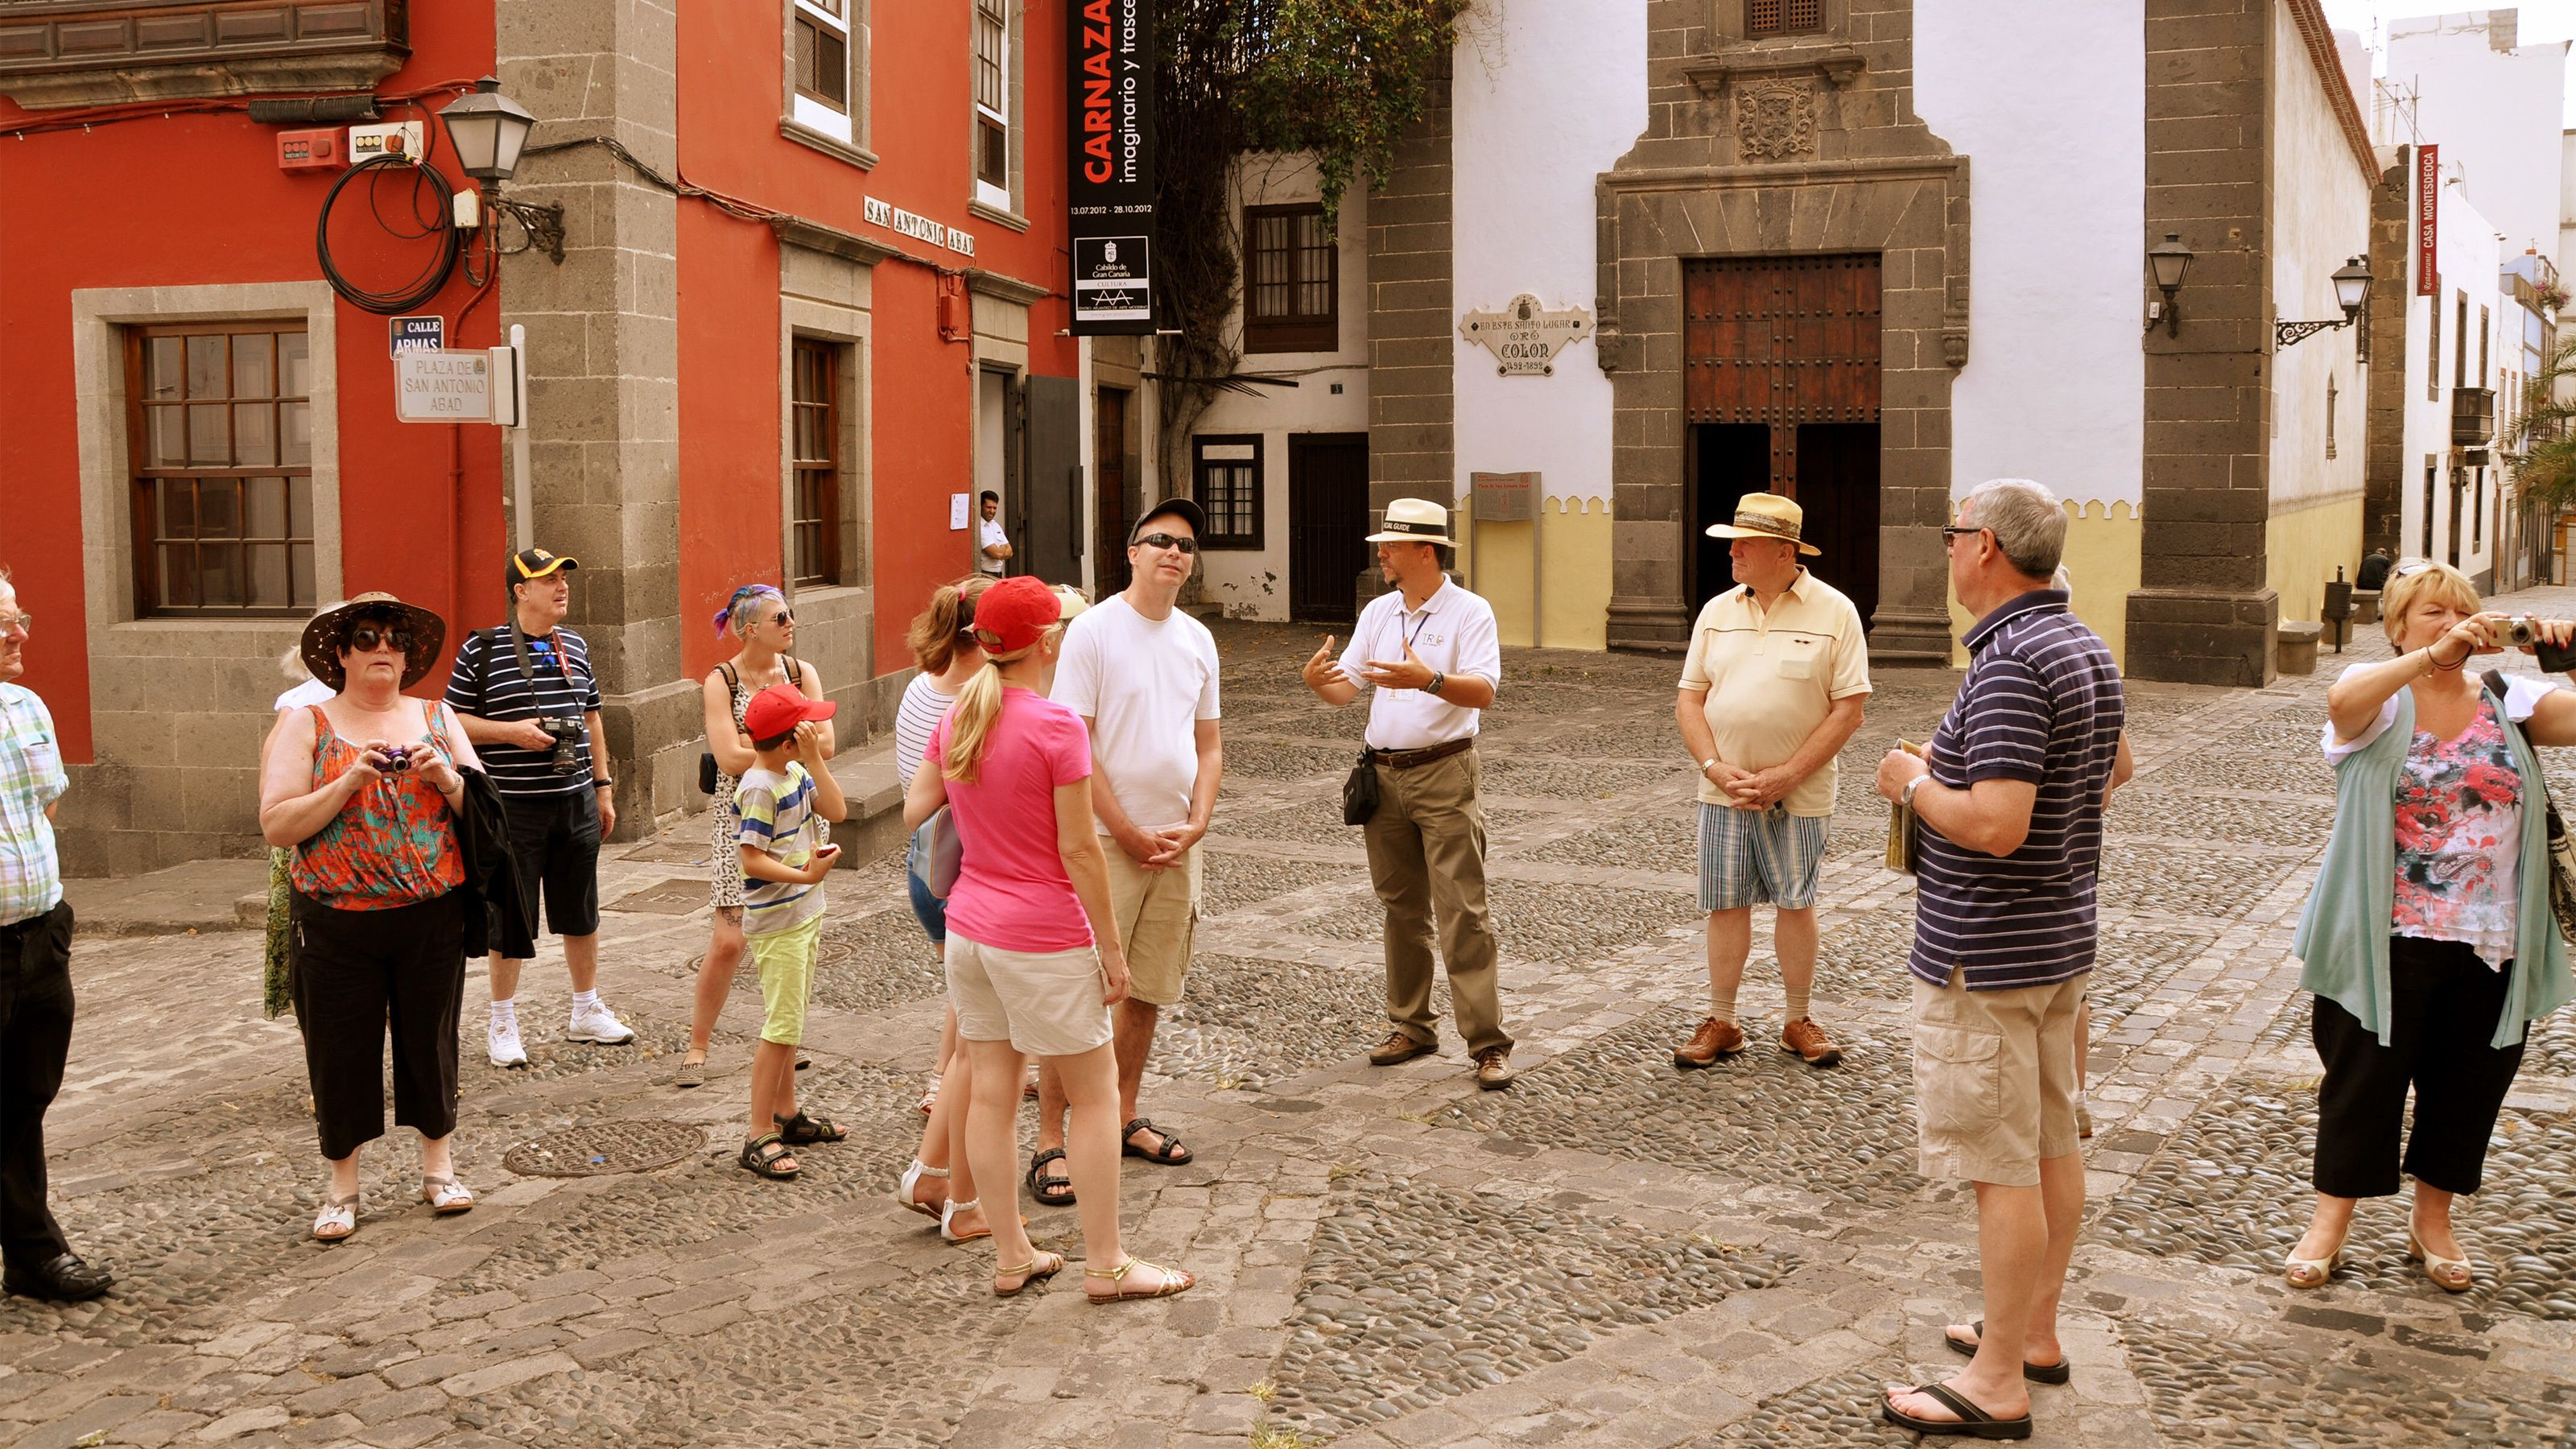 Tur i gamlebyen med Columbus-museet